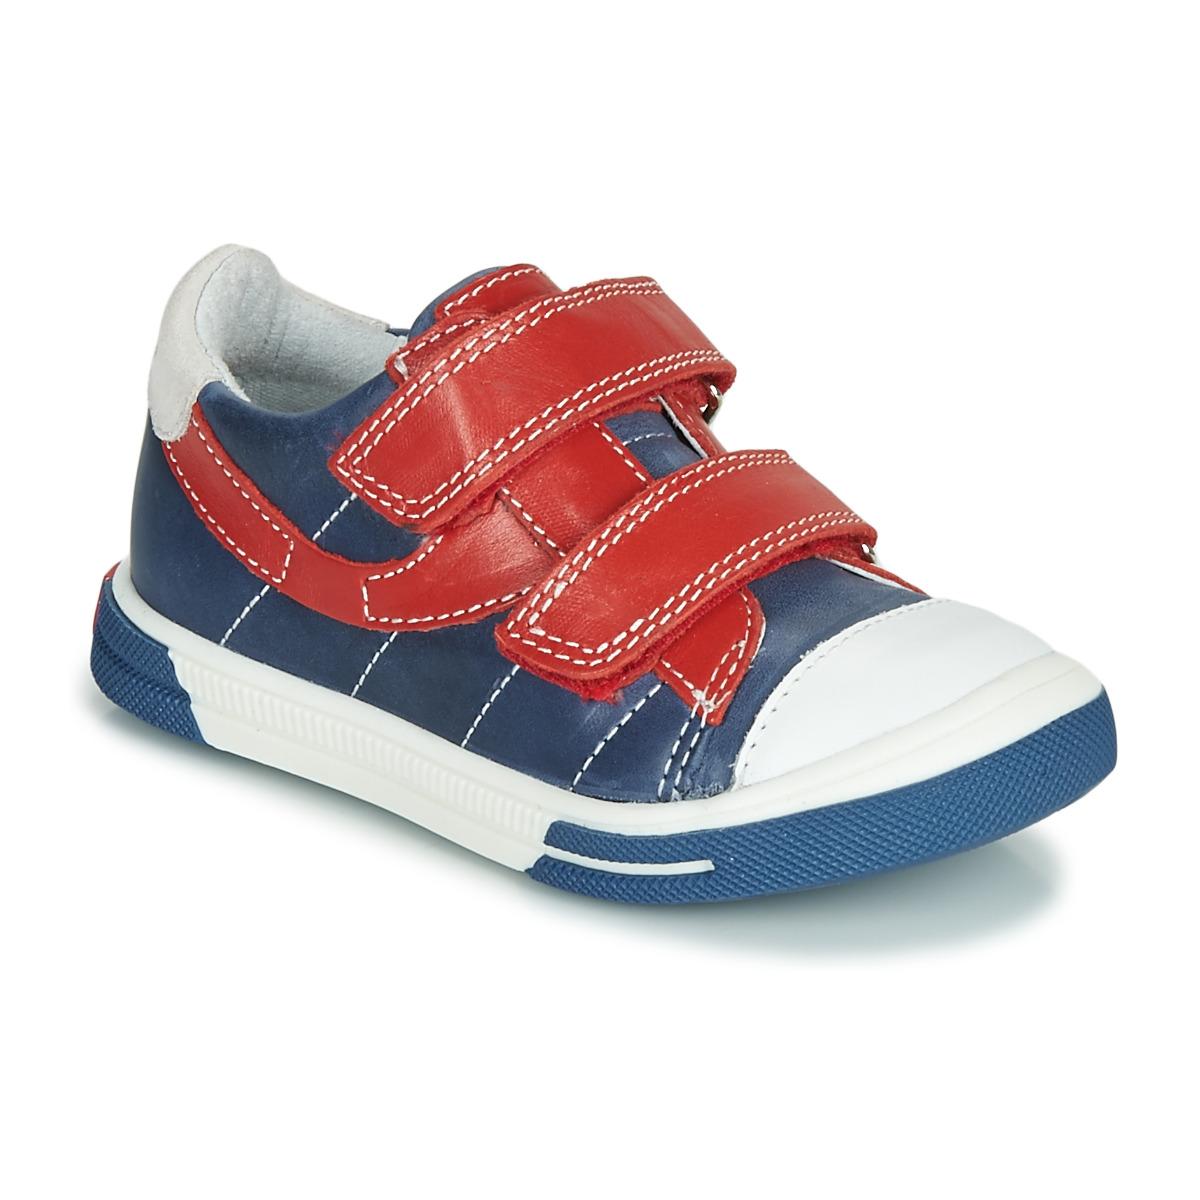 Støvler til børn Catimini  SORBIER